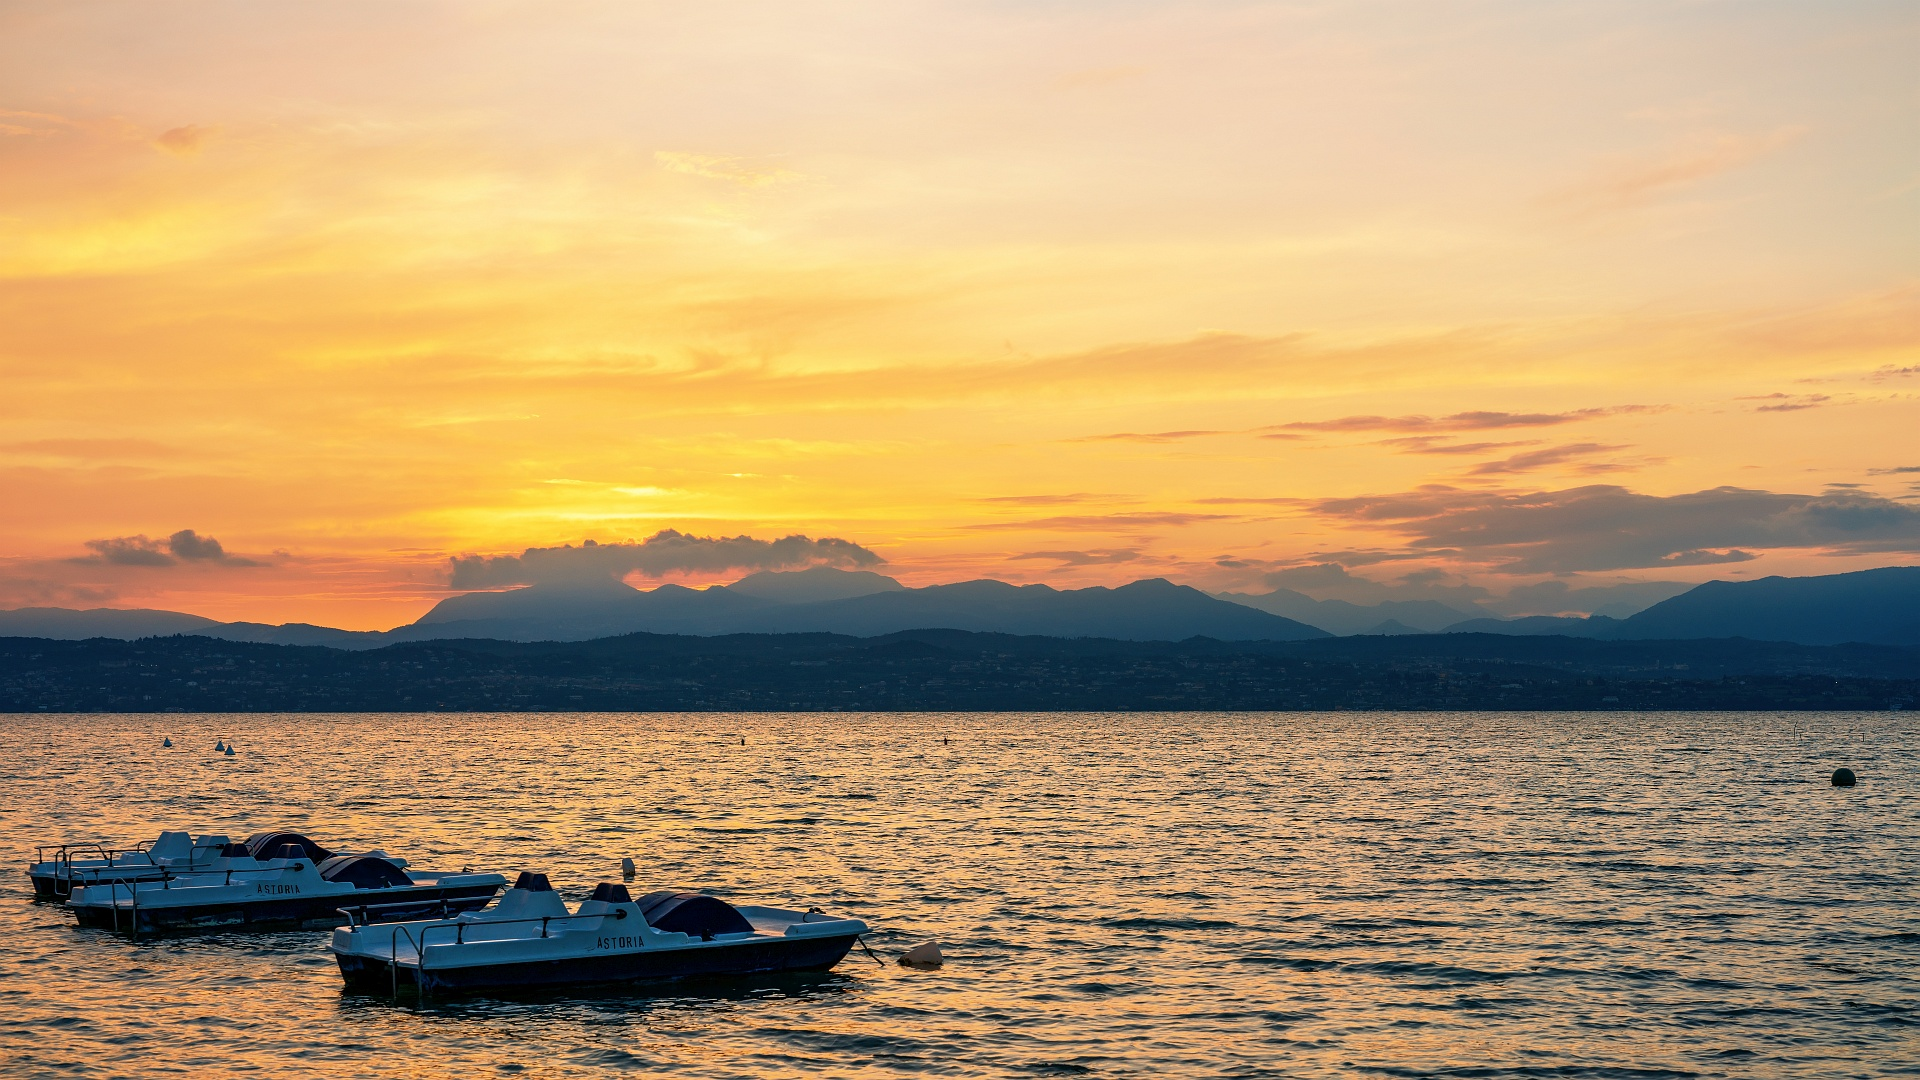 Lake Sunset Mood